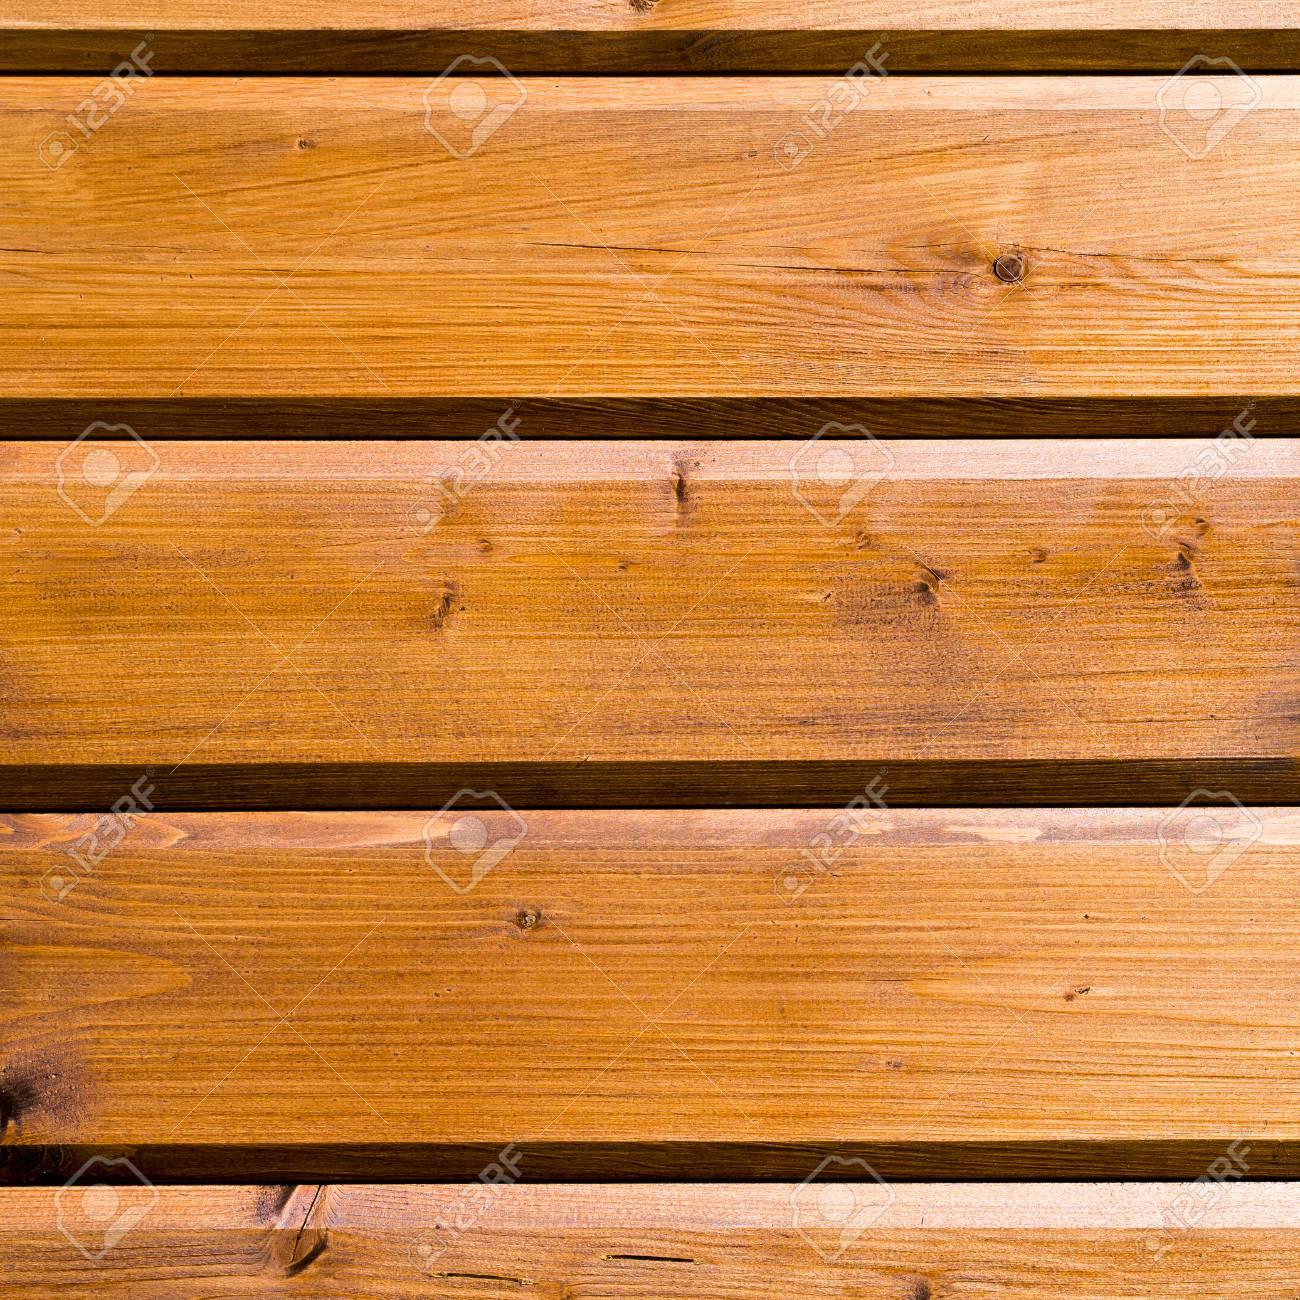 Planed Wood